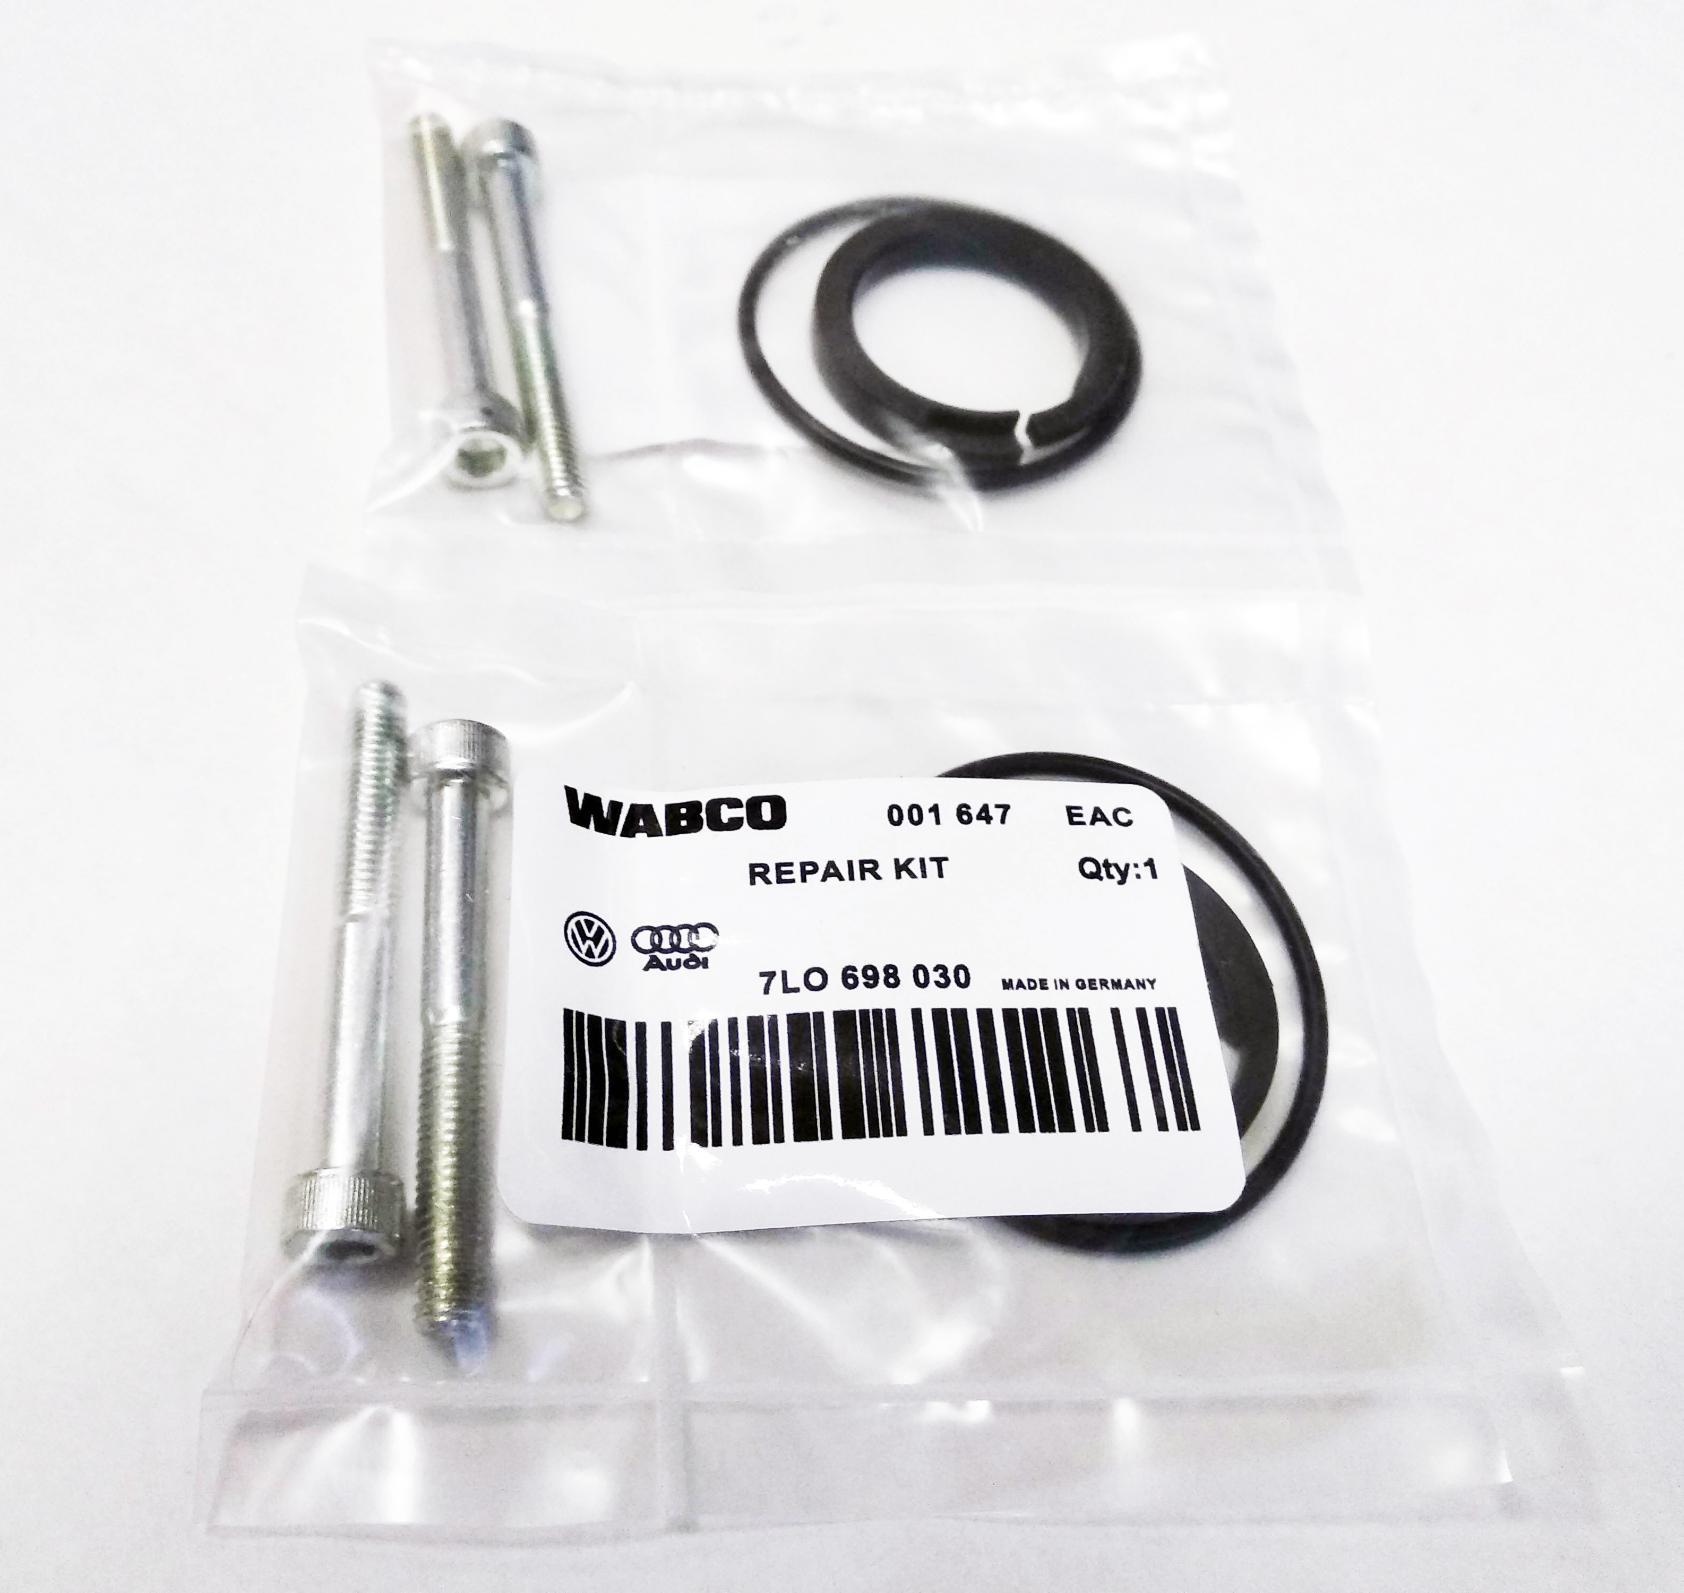 картинка Малый ремкомплект компрессора пневмоподвески Wabco 7L0698030 от магазина пневмоподвески ПневмоМаркет